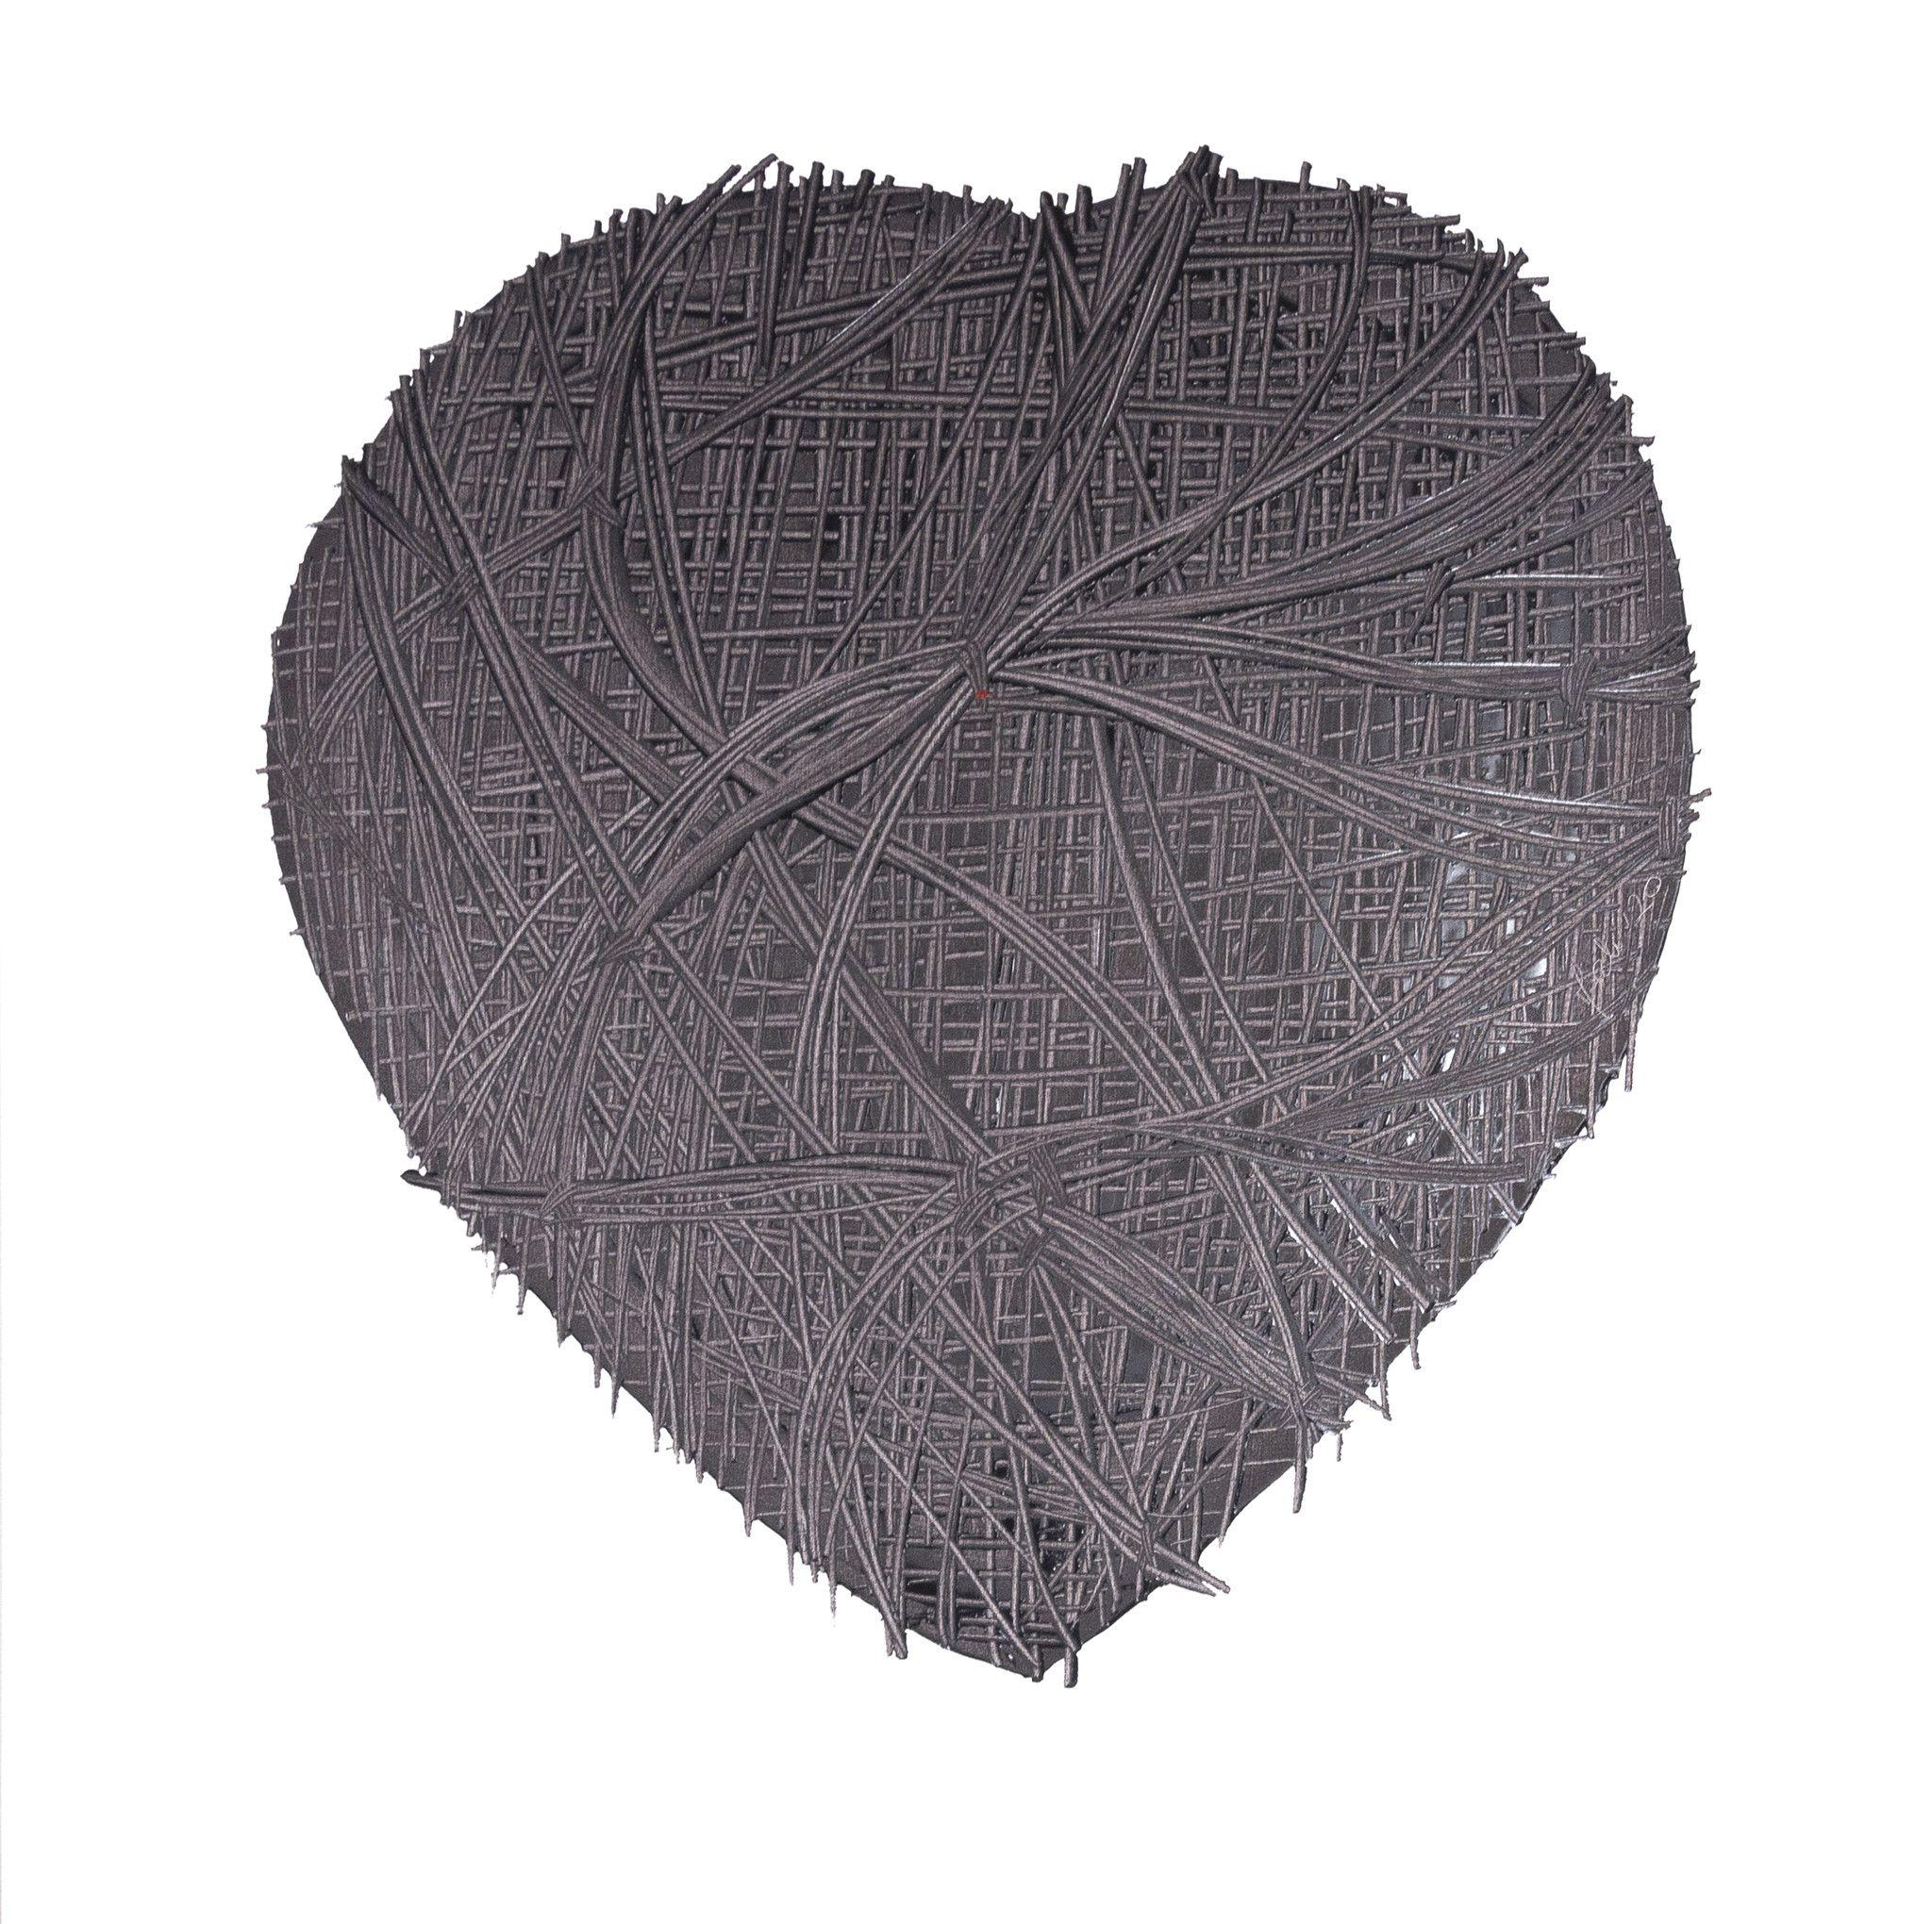 OLIO SU TELA ERIKA MARCHI ' LOVE IS IN THE AIR '  dimensioni L 100 x H 100 cm.